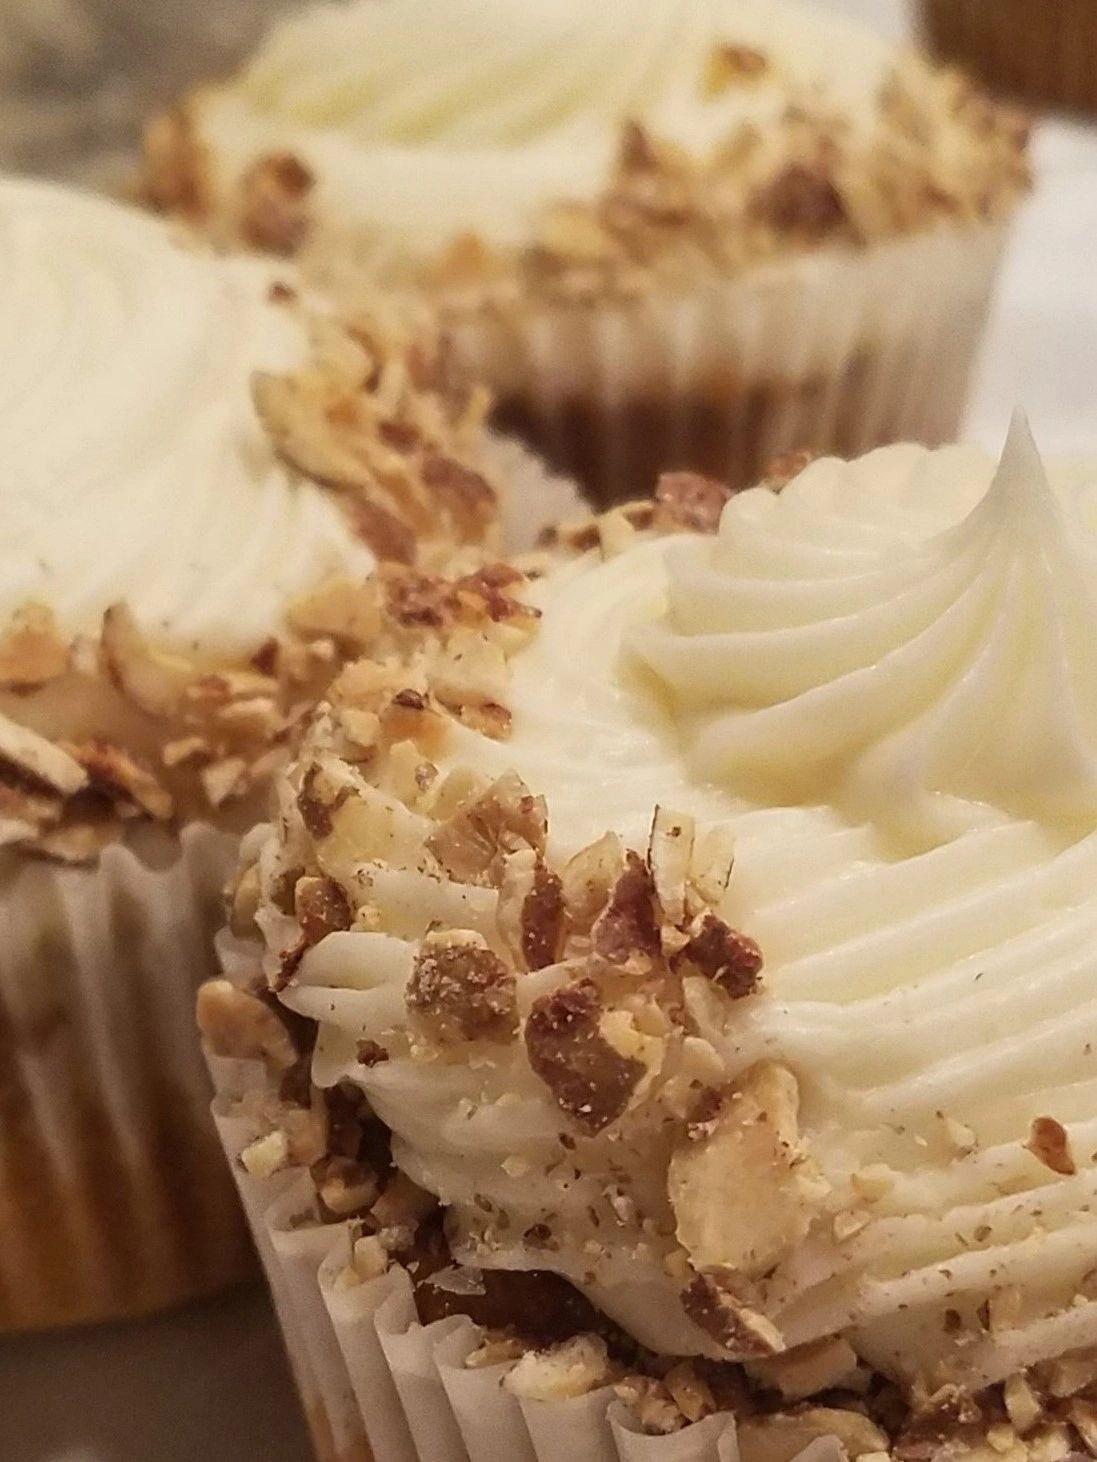 Cupcakes Sioux Falls  Bakery Cupcakes Intoxibakes Sioux Falls South Dakota